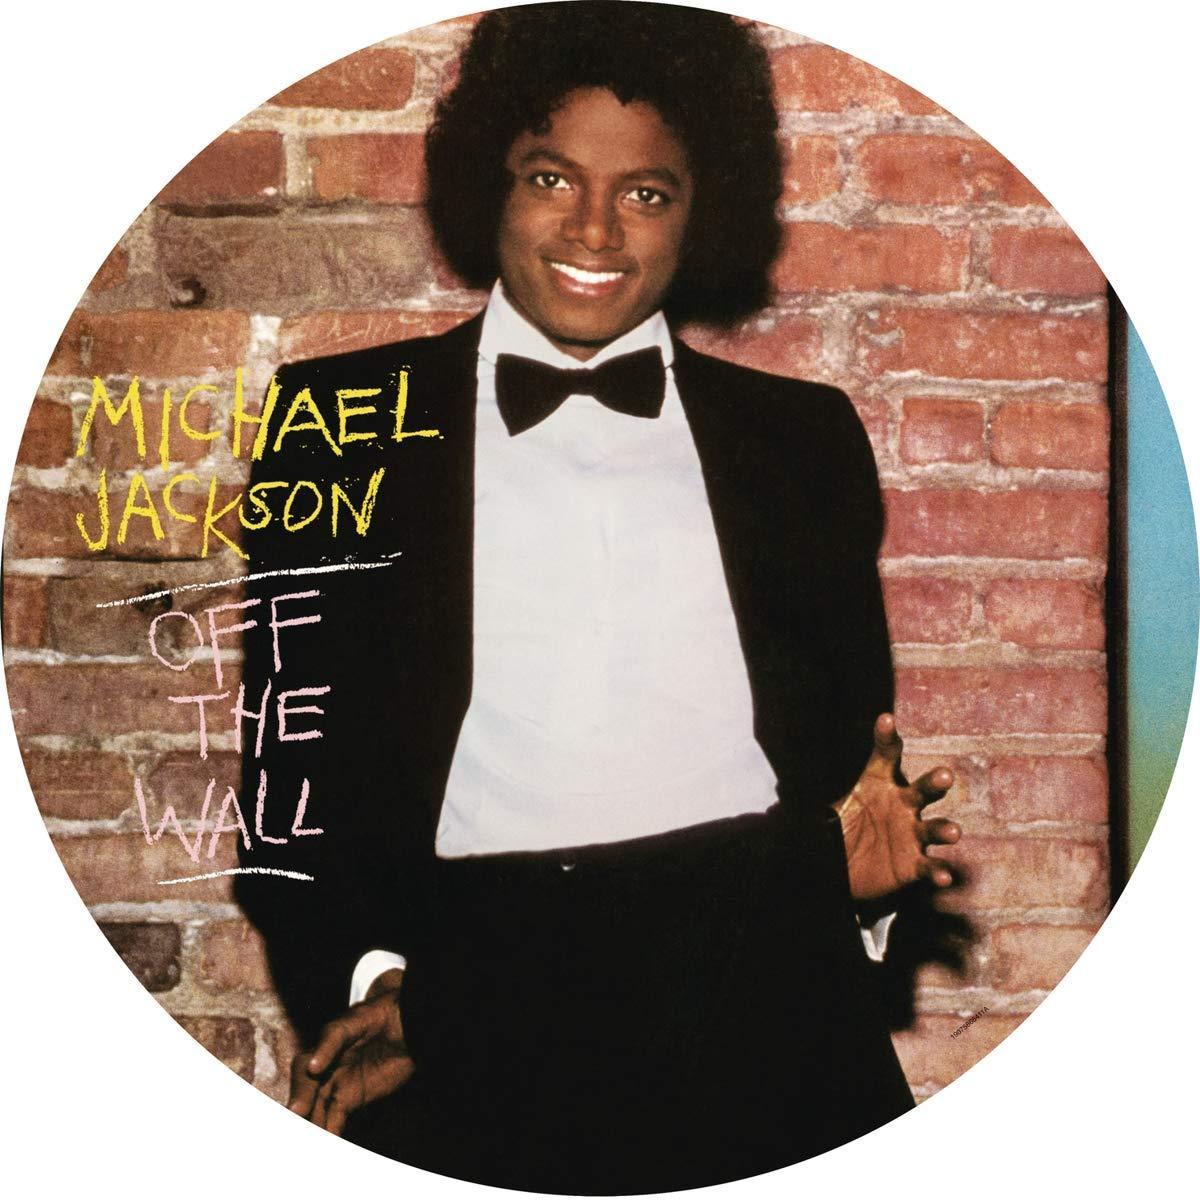 Майкл Джексон Michael Jackson. Off The Wall (LP) michael jackson michael jackson off the wall picture